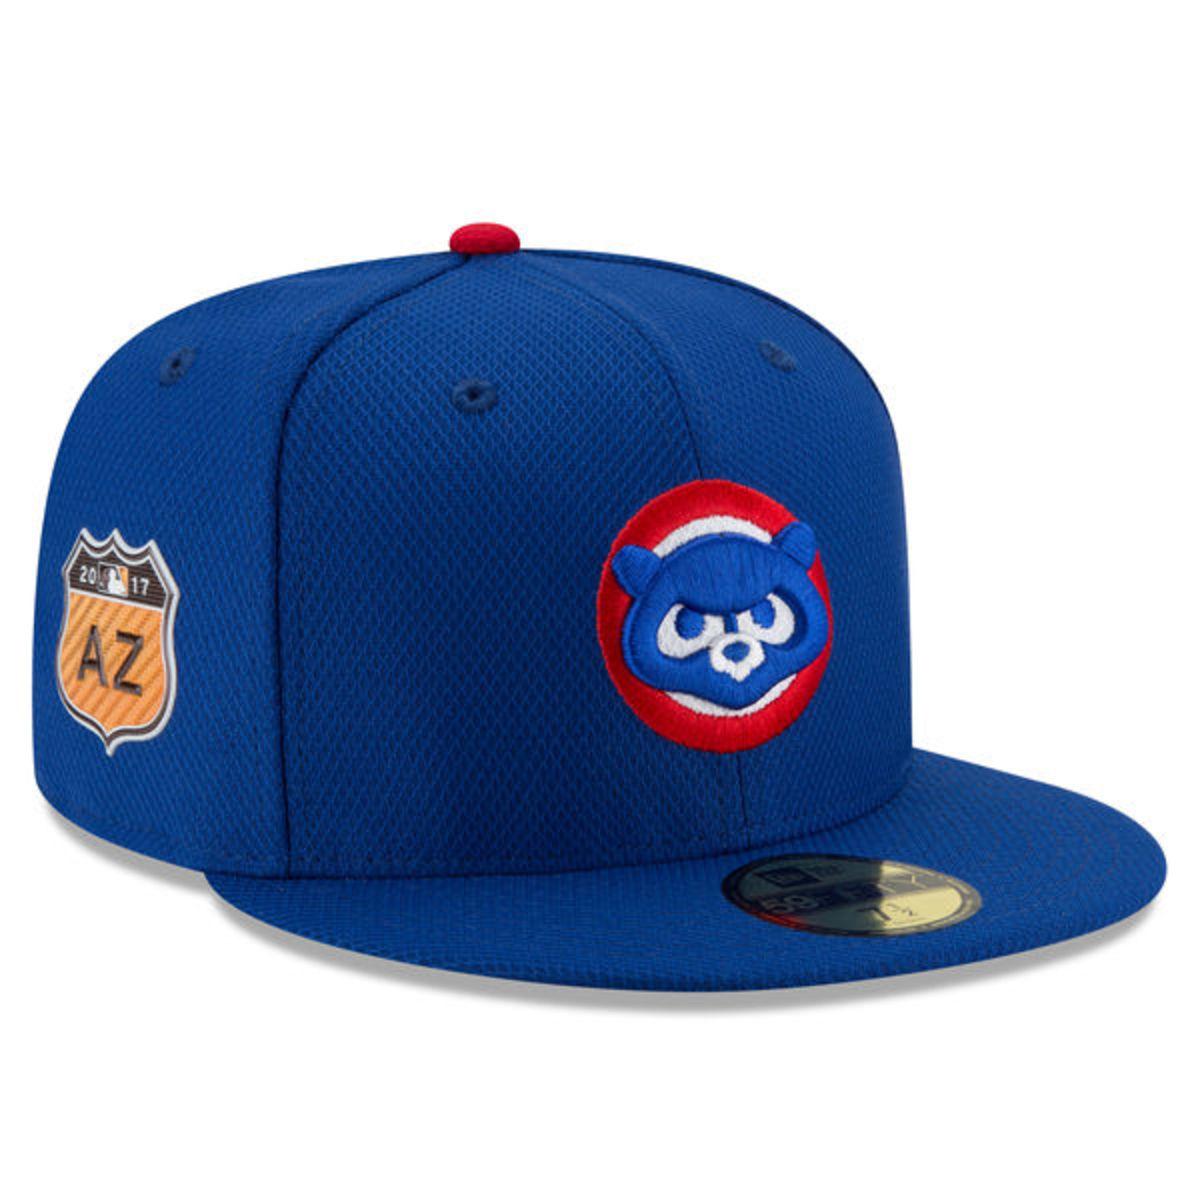 cubs-spring-training-hat.jpg